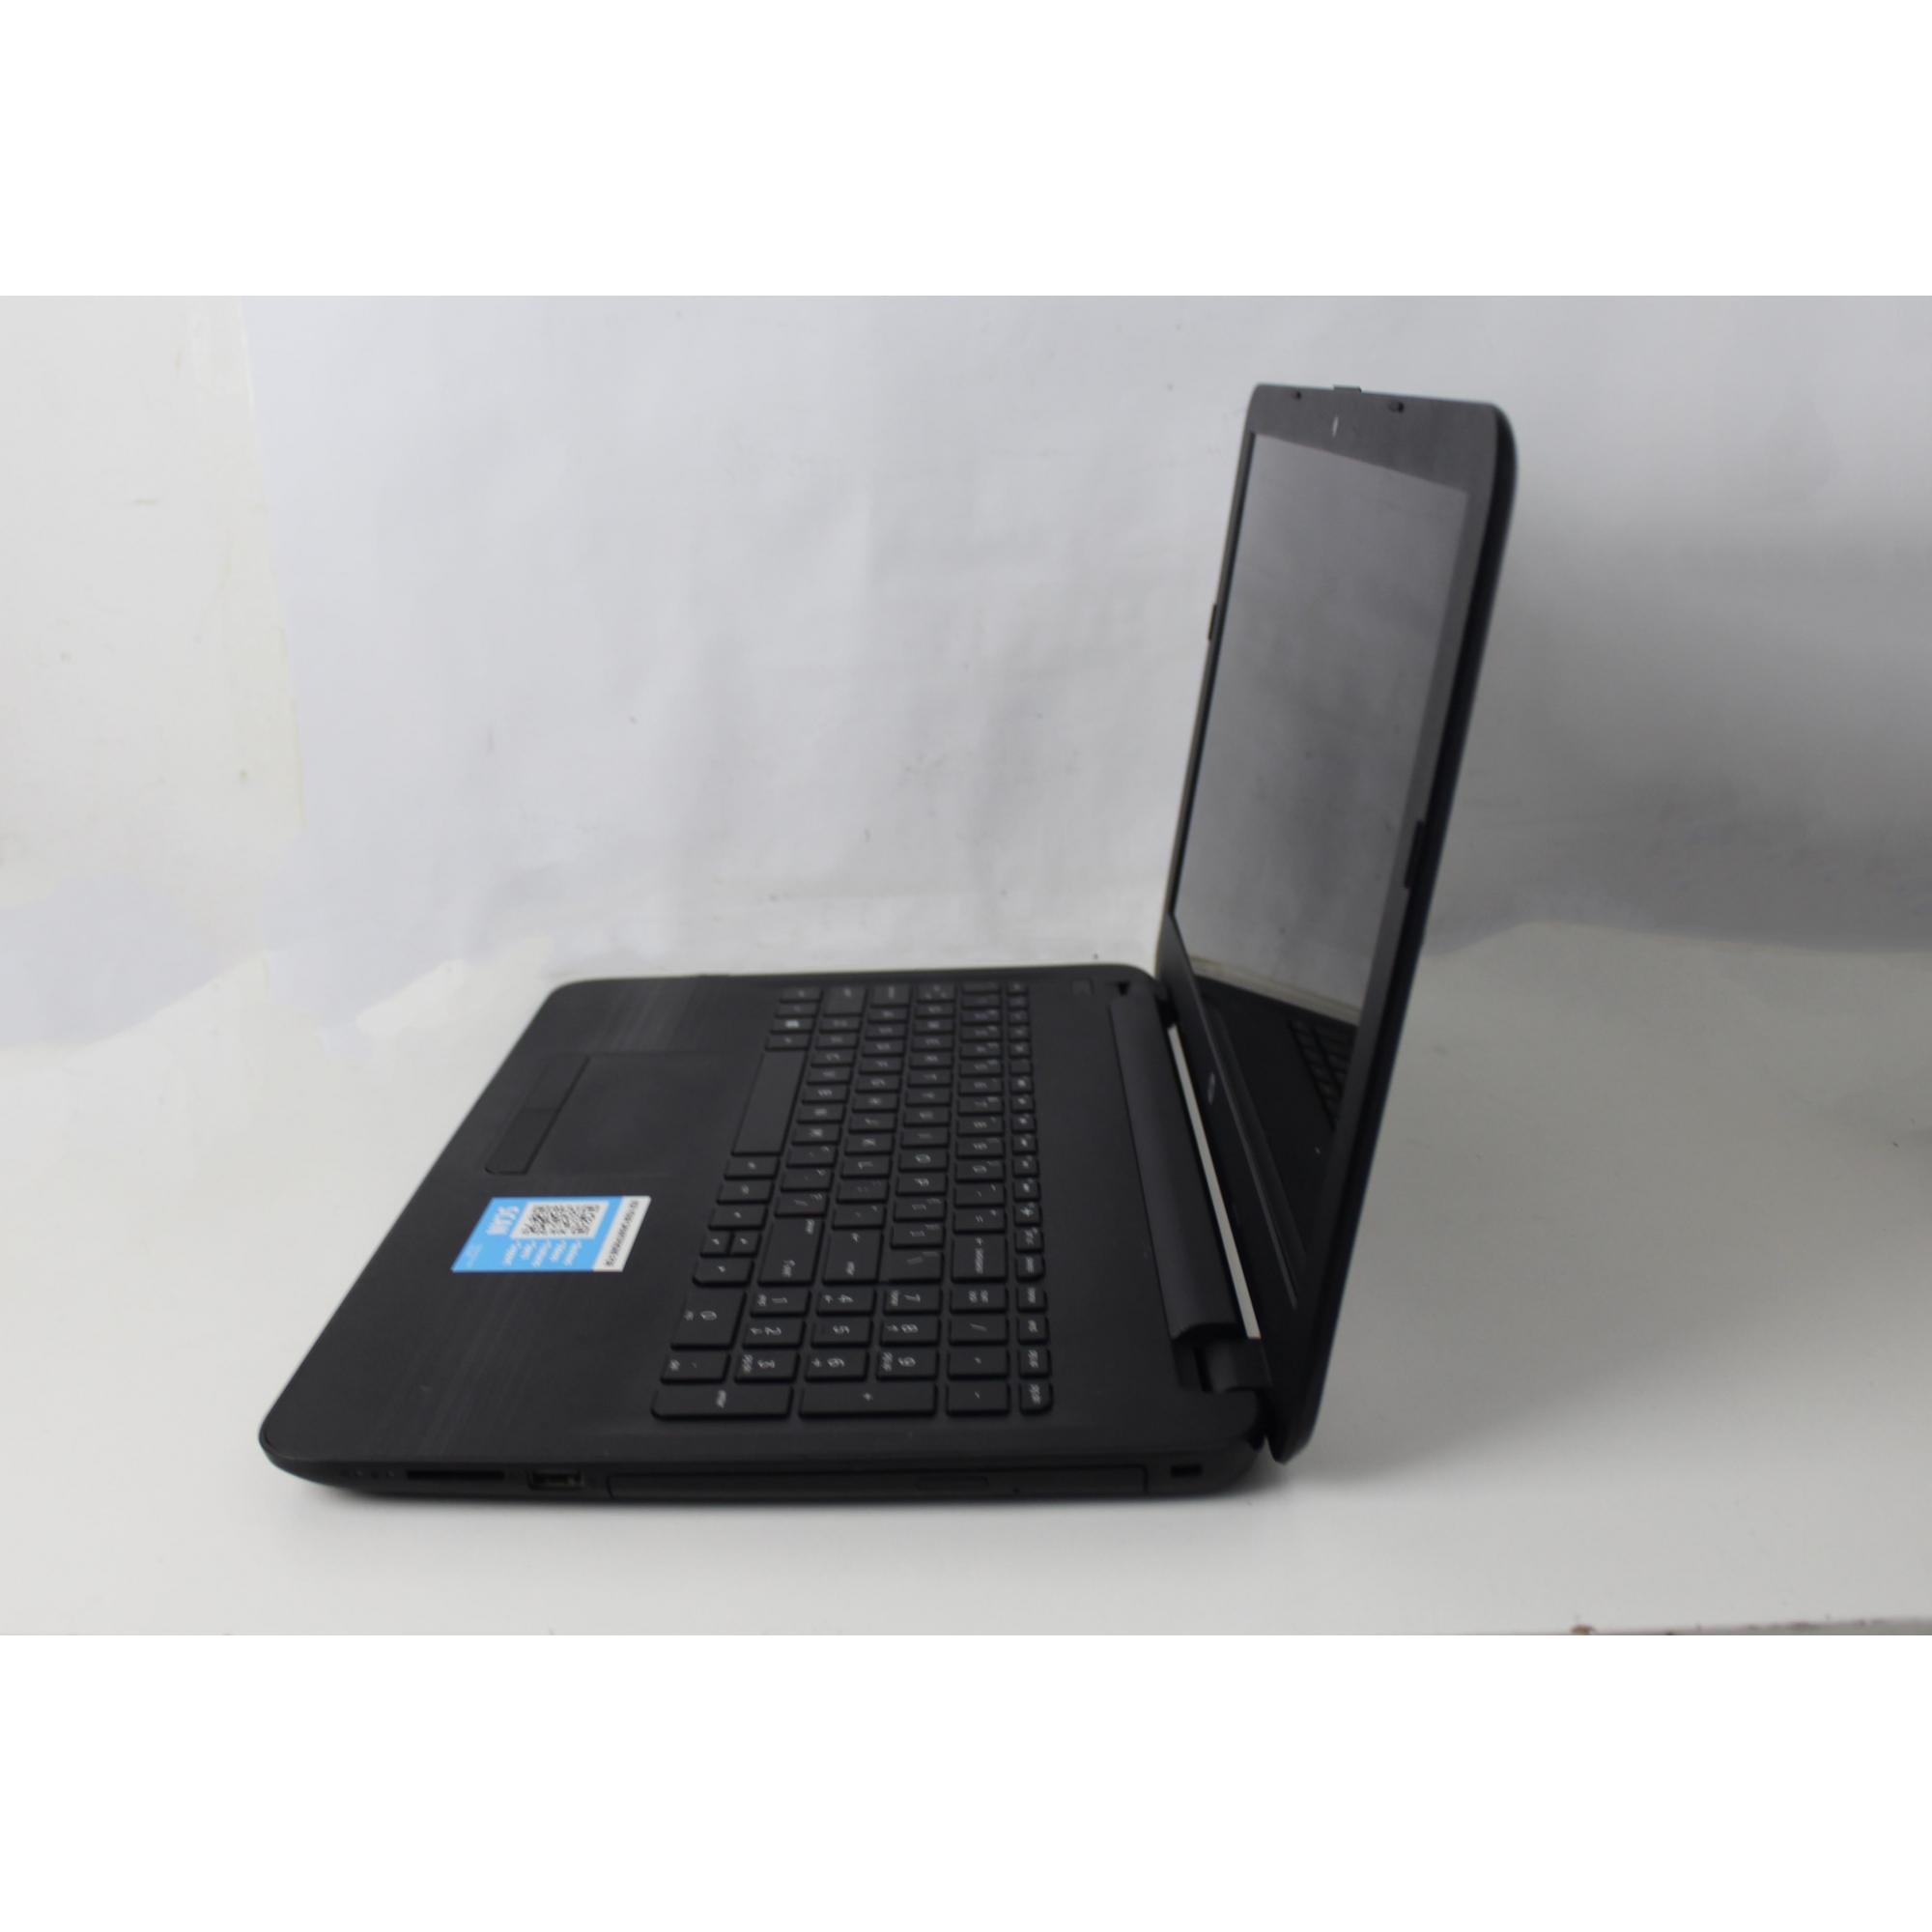 "NOTEBOOK HP 15-ba009x 15,6"" AMD A6-7310 4GB SSD-120GB + Alfanumérico"